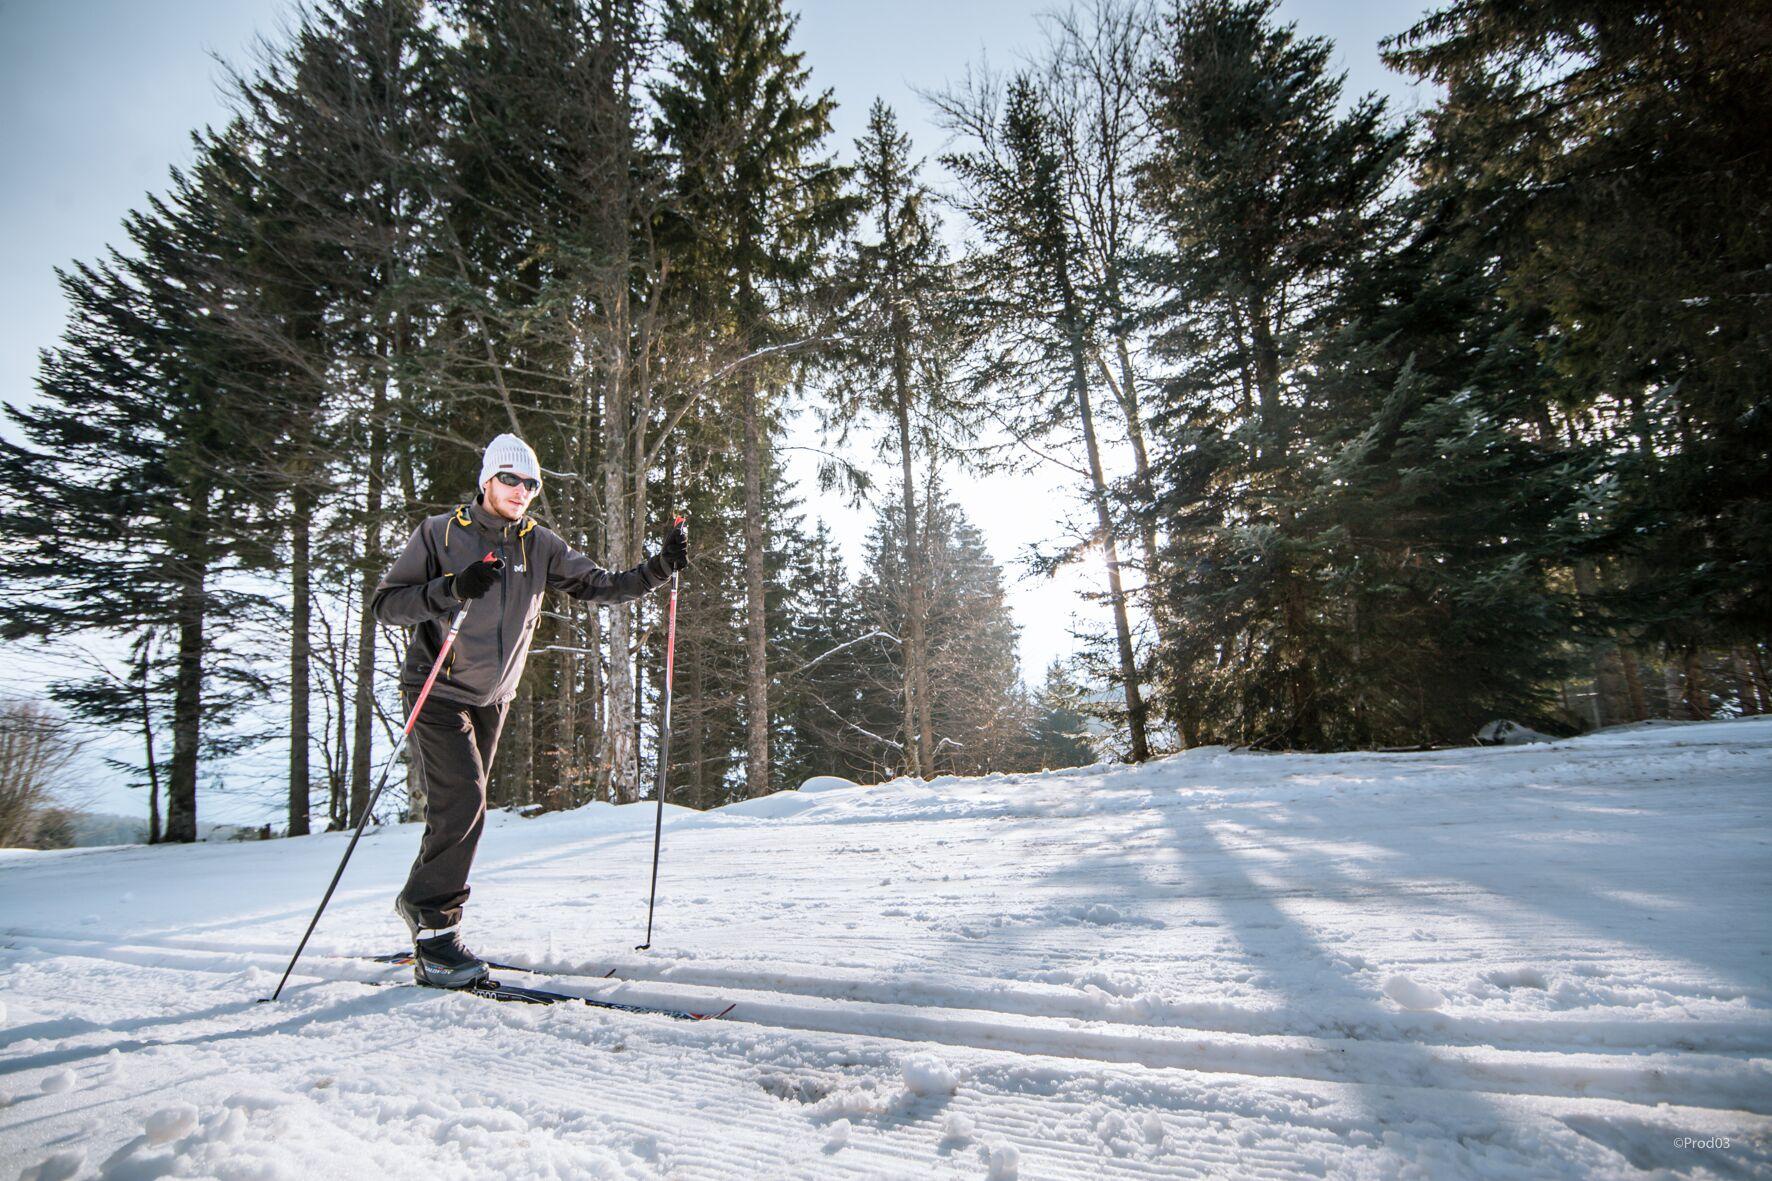 praboure-station-de-ski-hiver-randonnee